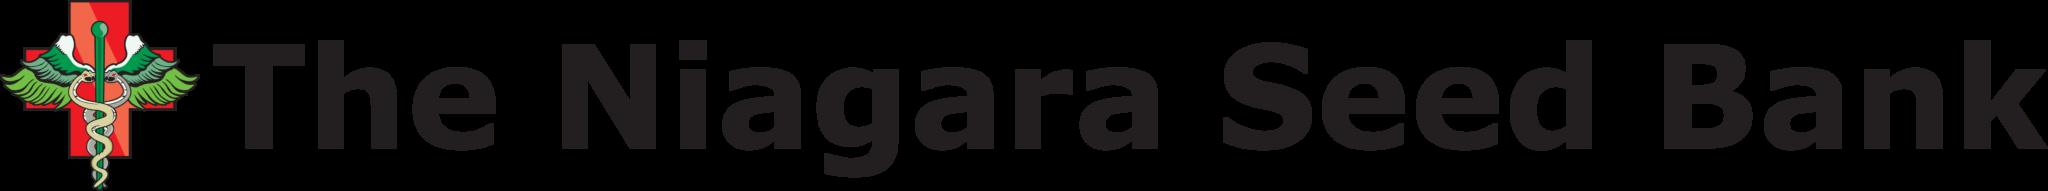 niagara-seed-bank-logo03